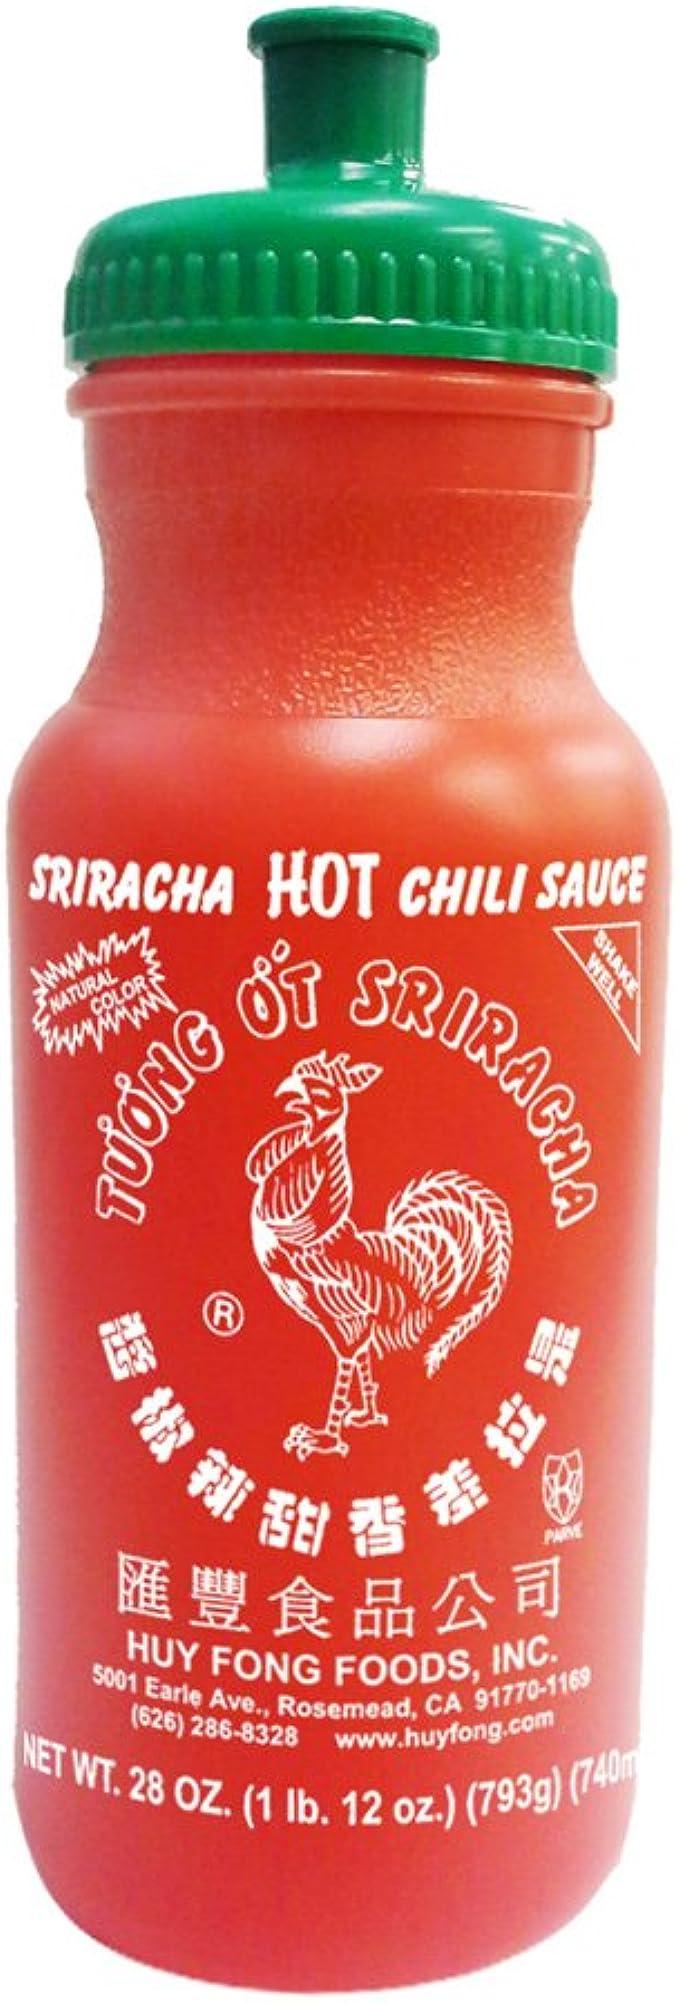 Sriracha Plastic Water Bottle Red